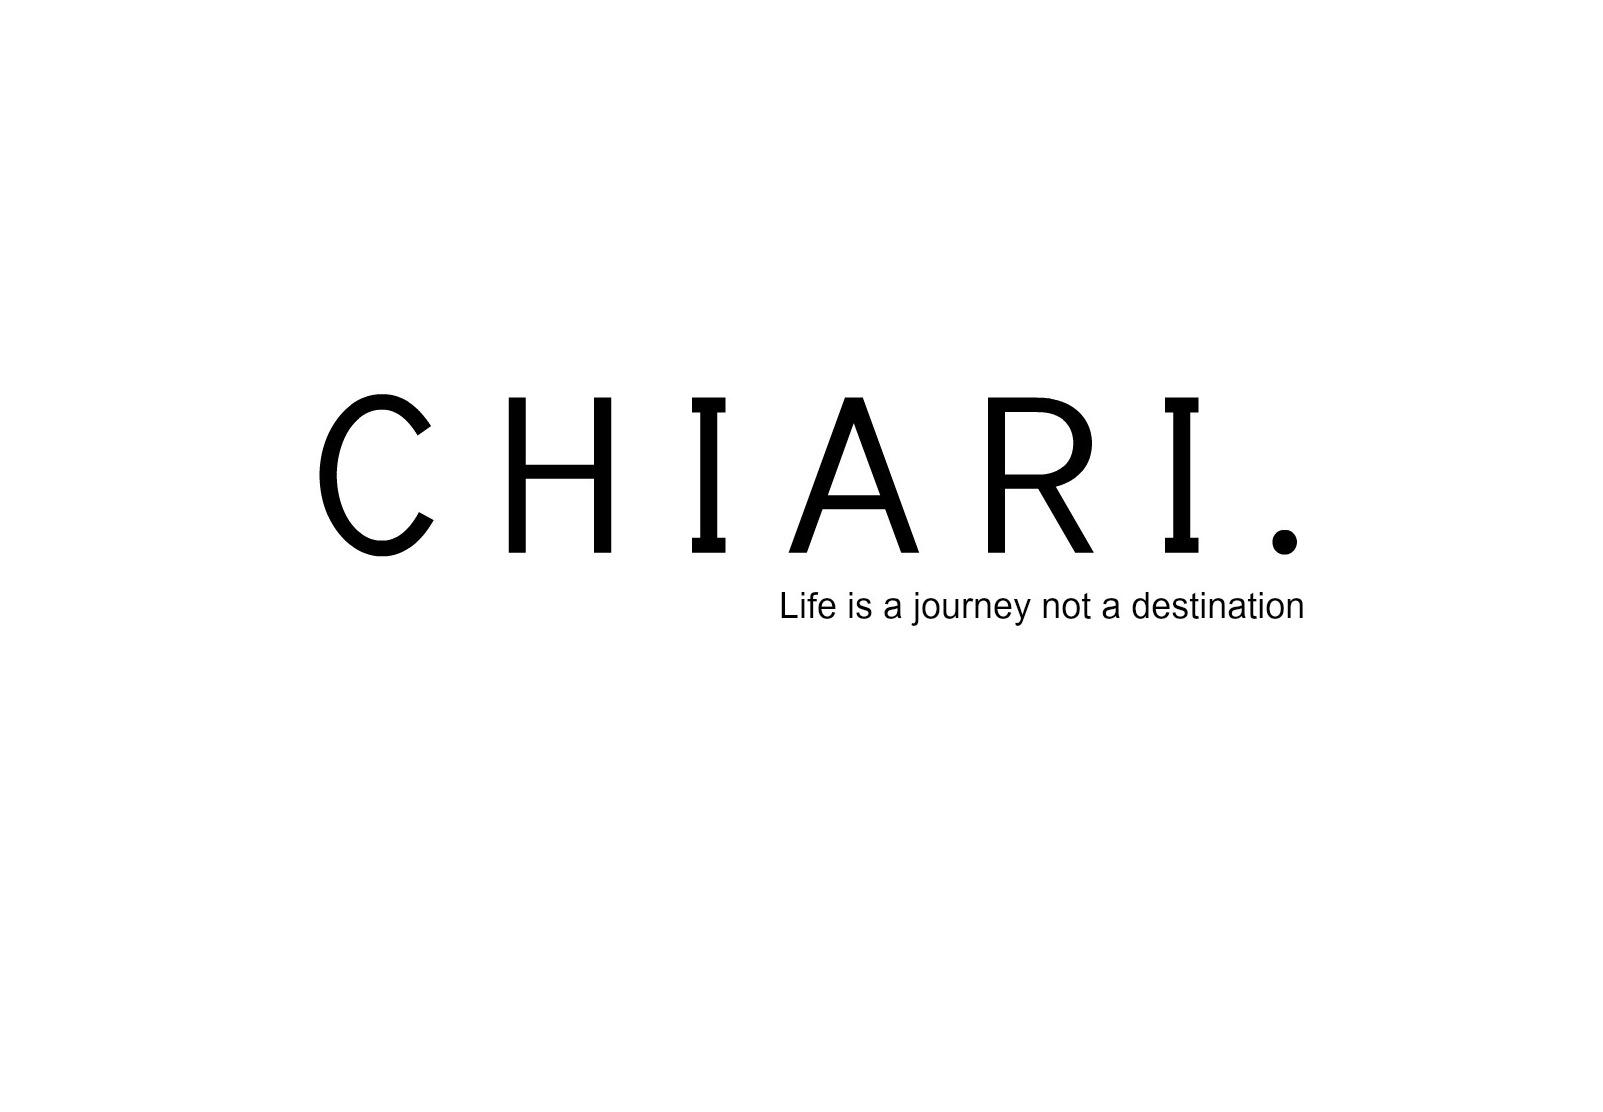 Chiari